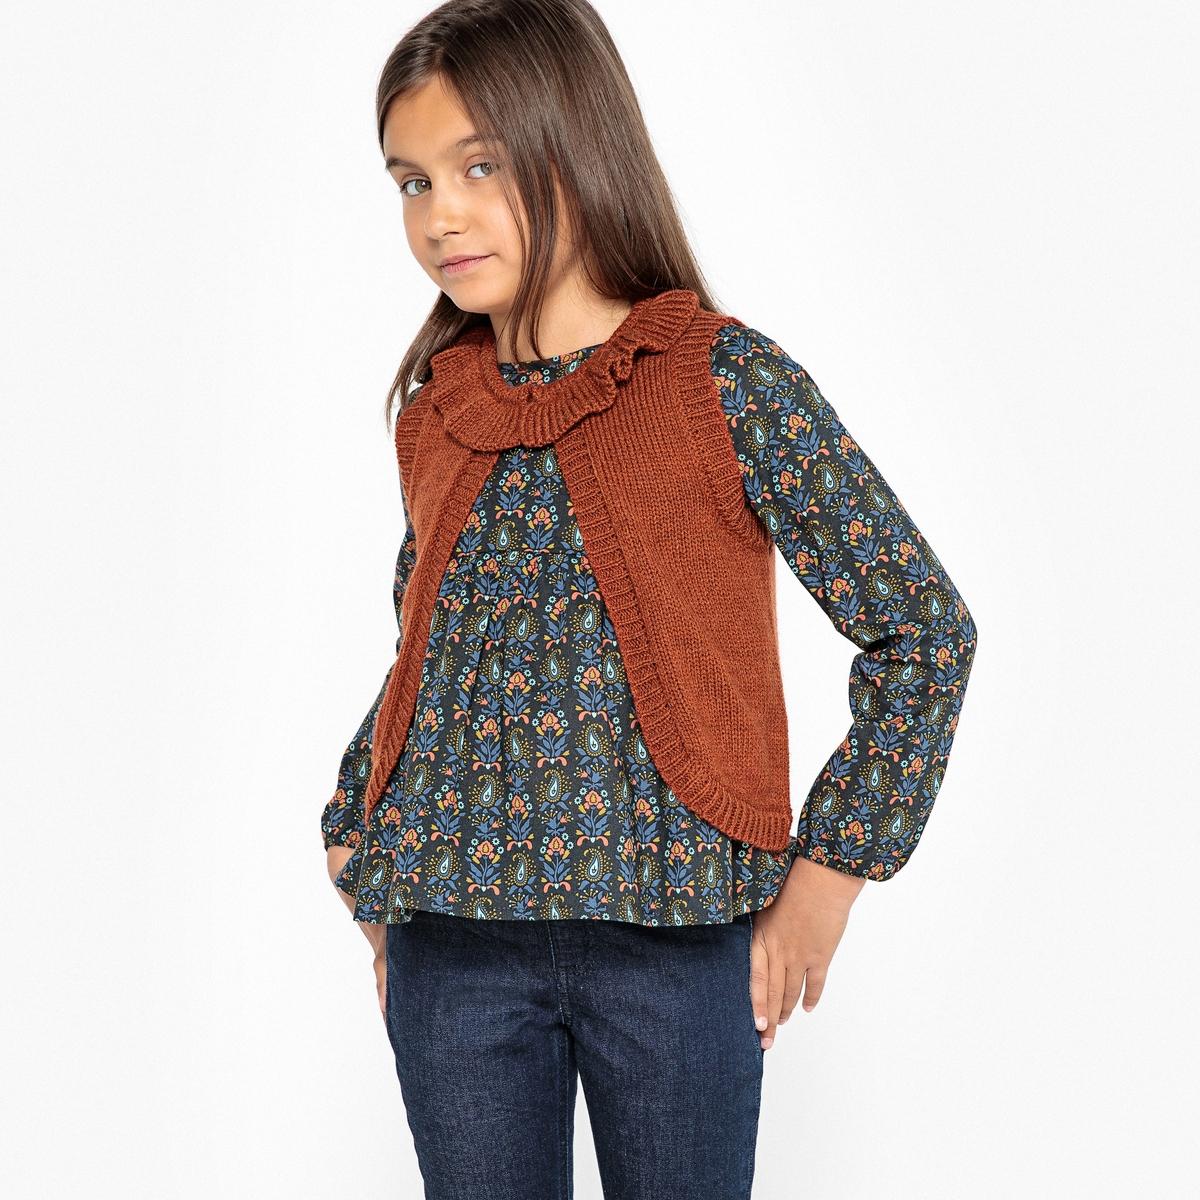 Комплект из блузки и кардигана без рукавов 3-12 лет блузки и рубашки